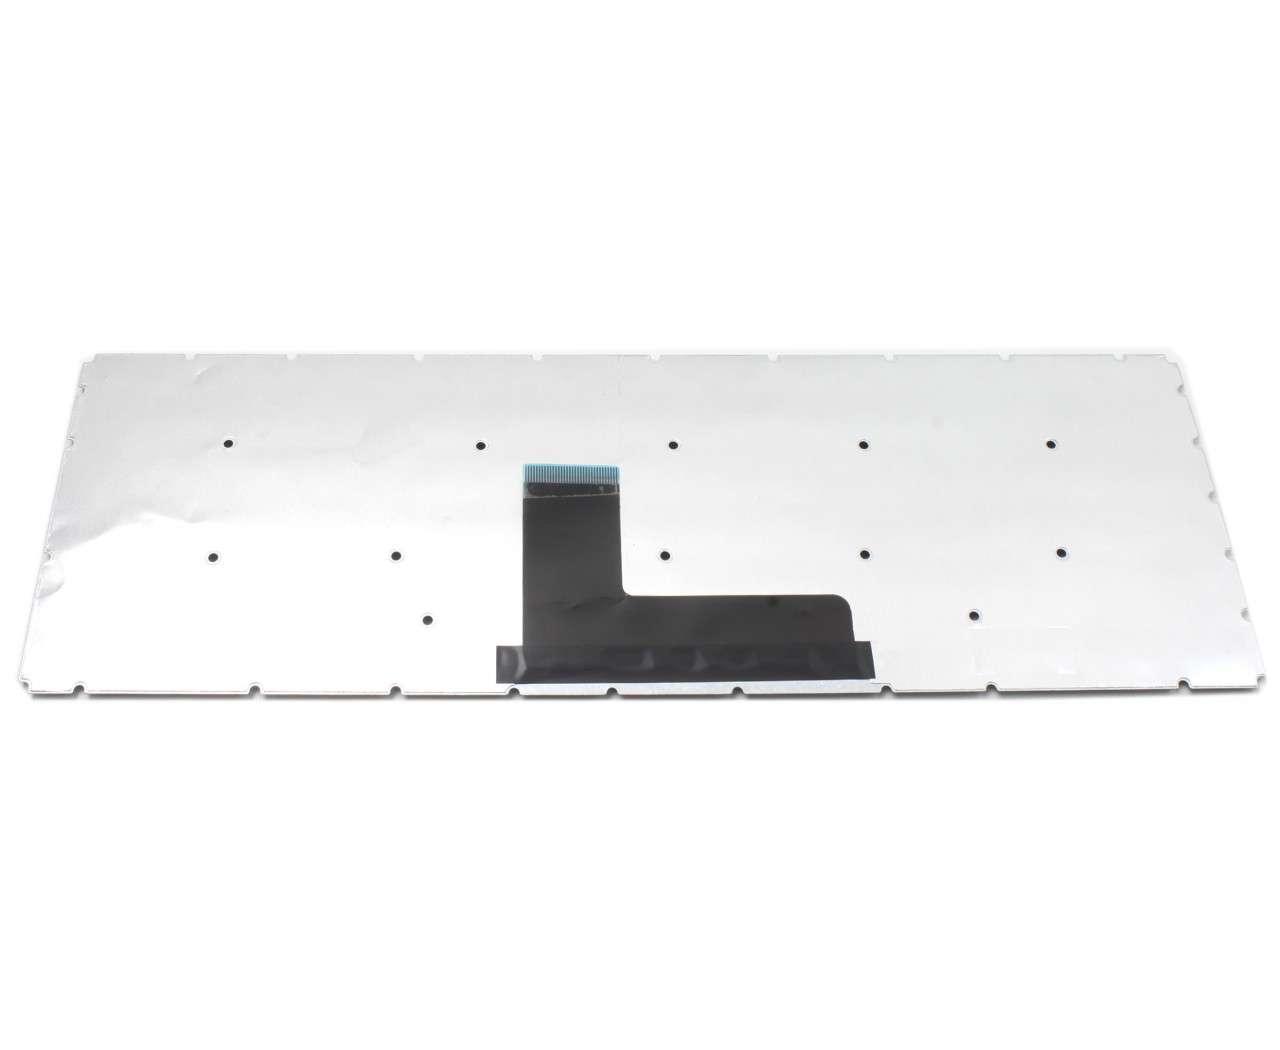 Tastatura Toshiba Satellite S50 B layout US fara rama enter mic imagine powerlaptop.ro 2021